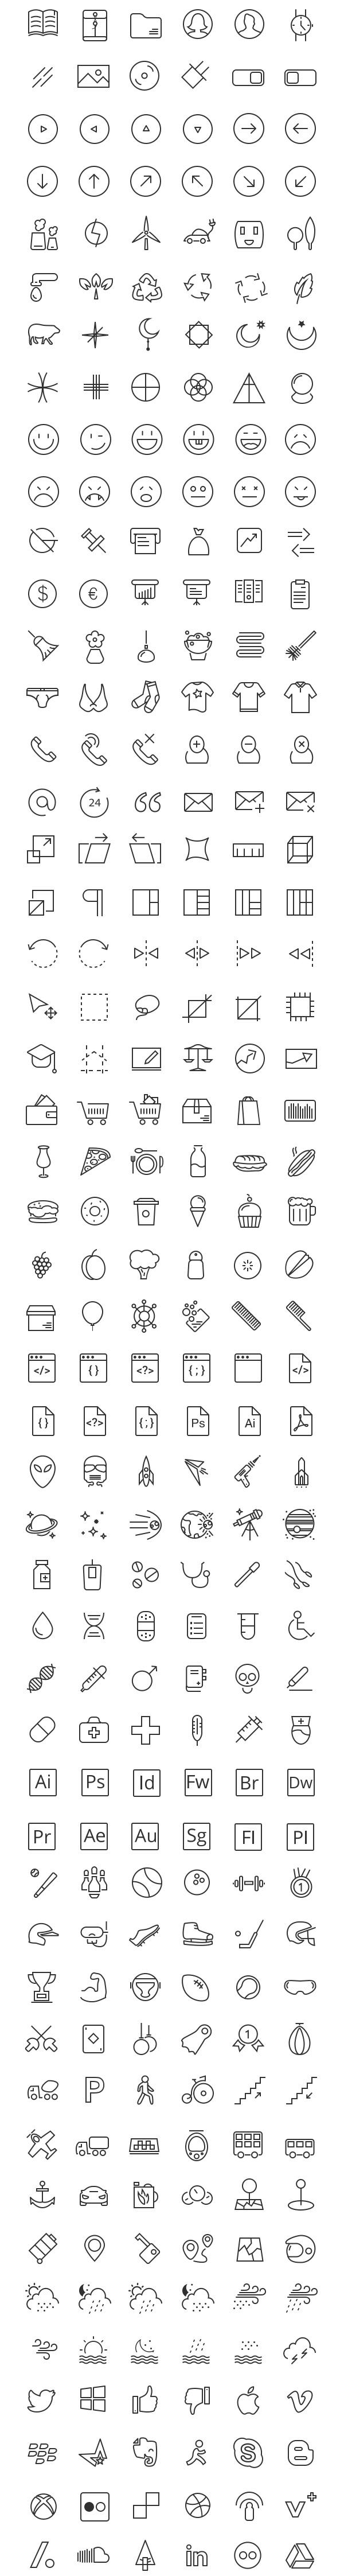 2.Retina-Free-300-icons-600